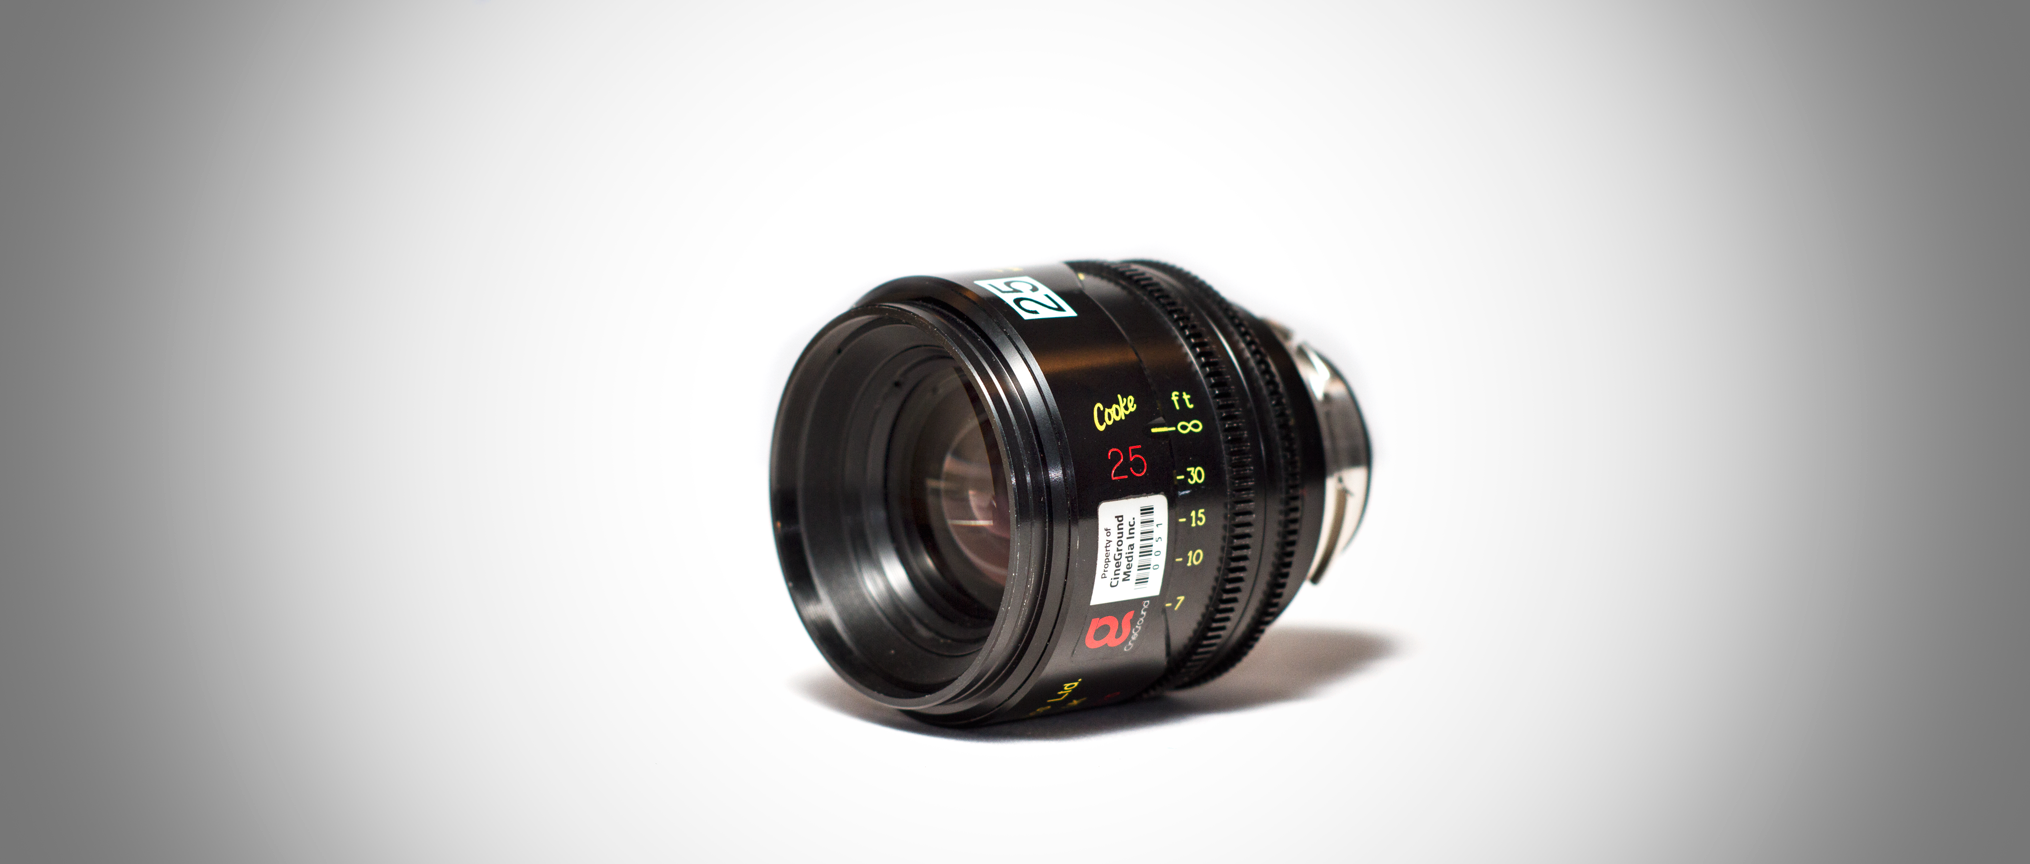 cooke-mini-s4-i-cineground-lens-rental